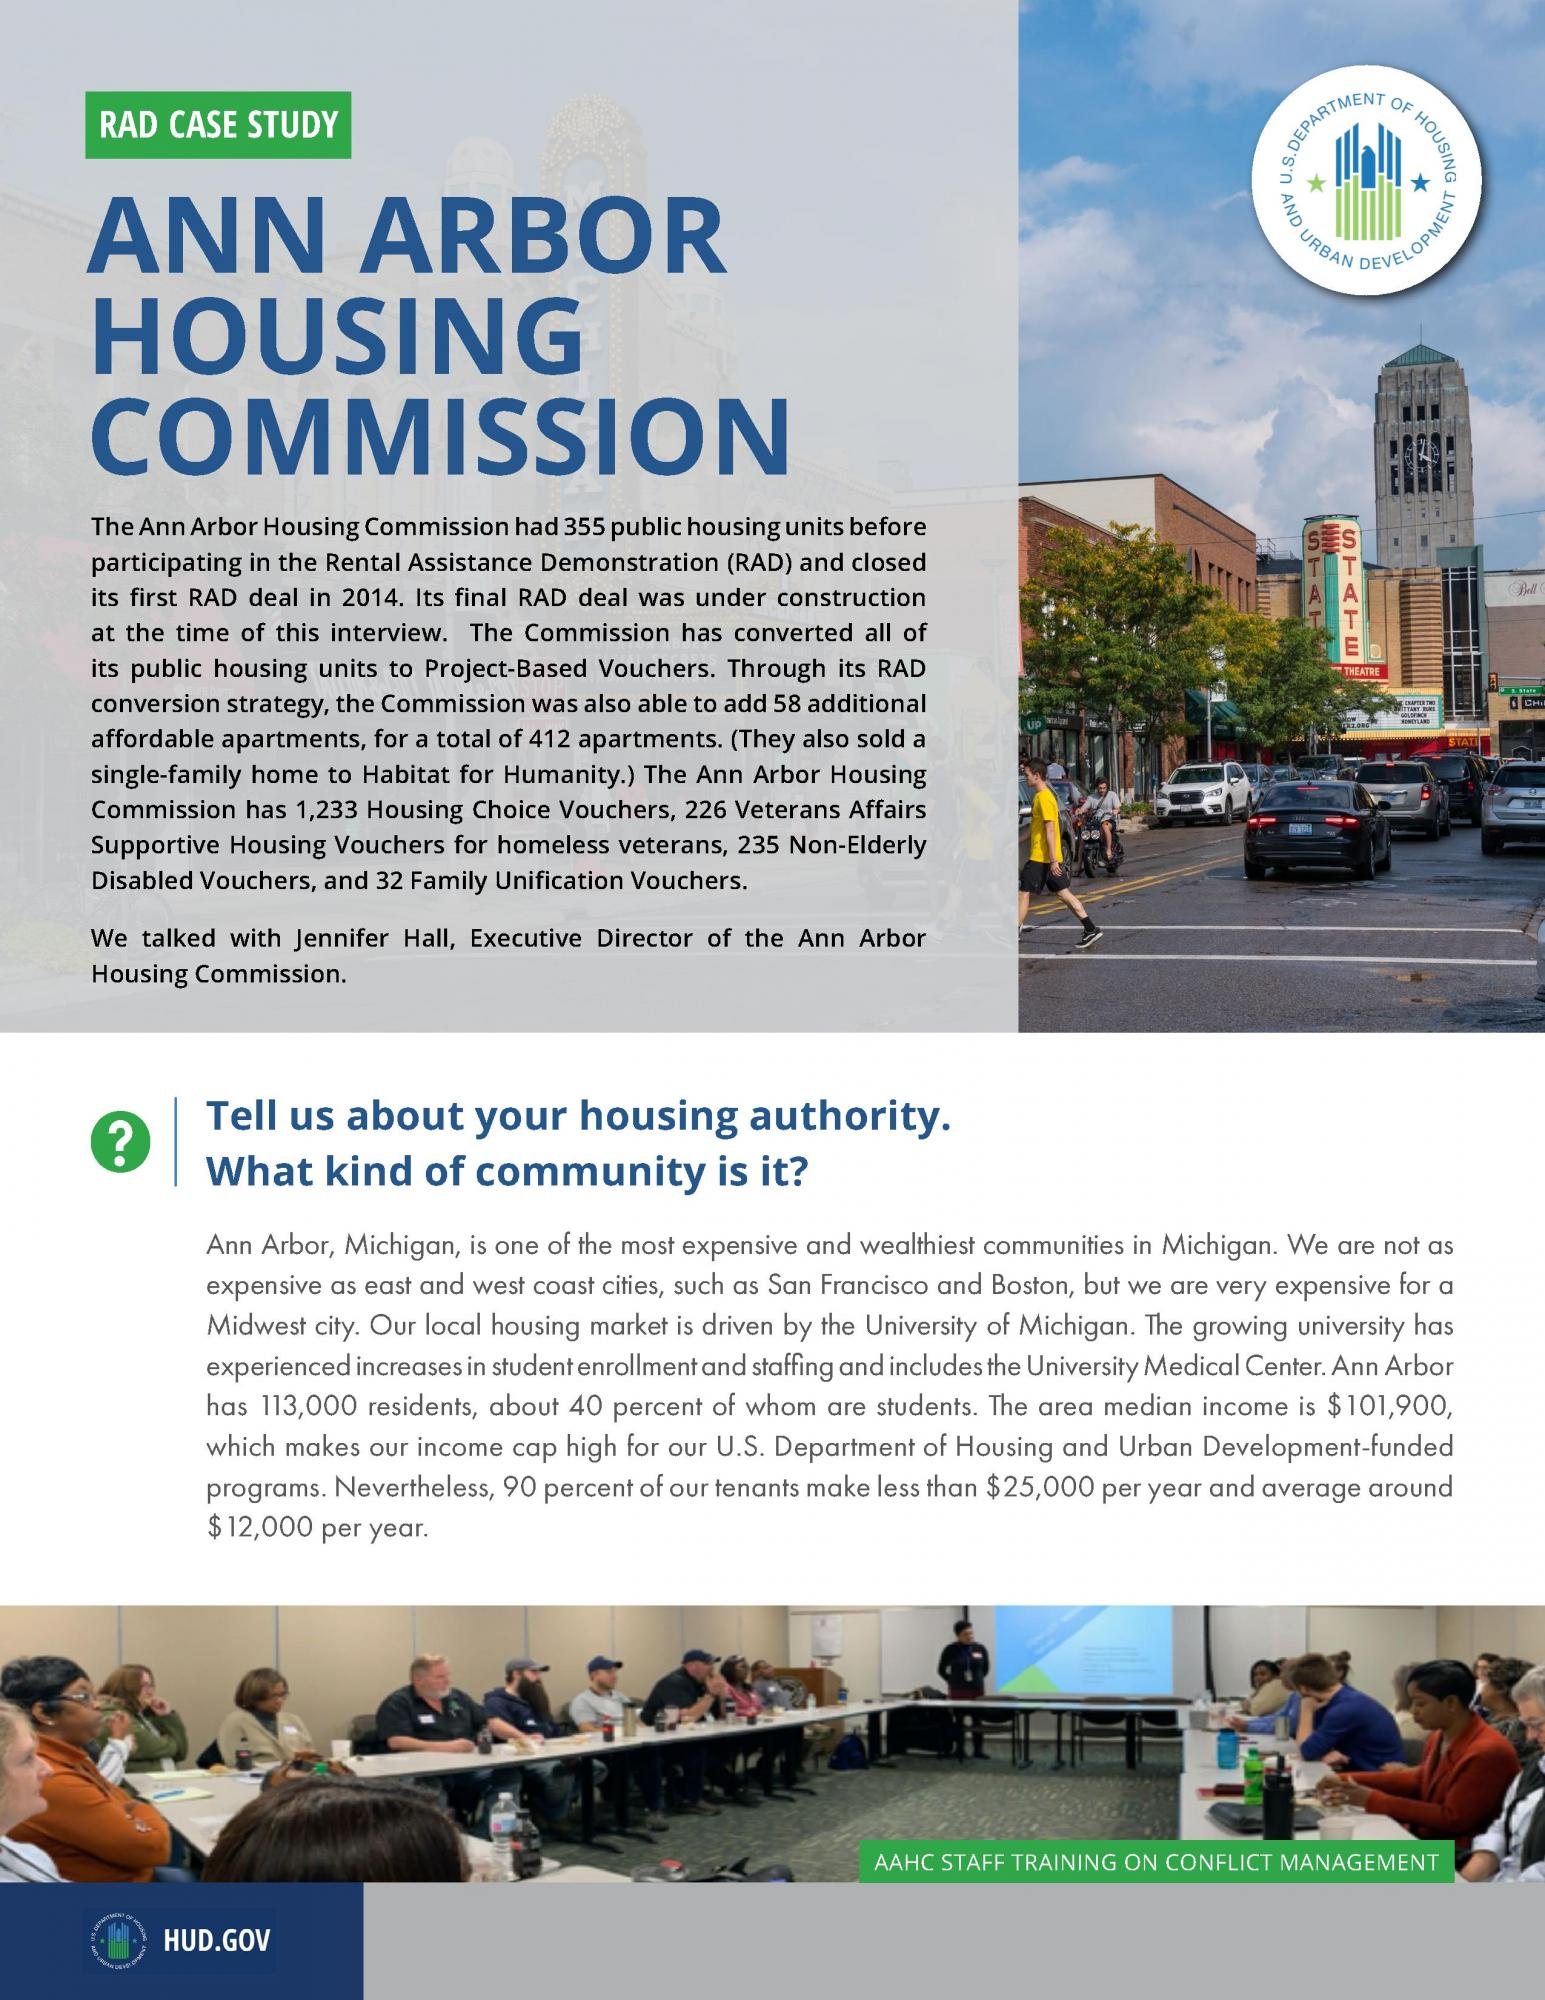 Ann Arbor Housing Commission Executive Director Q&A